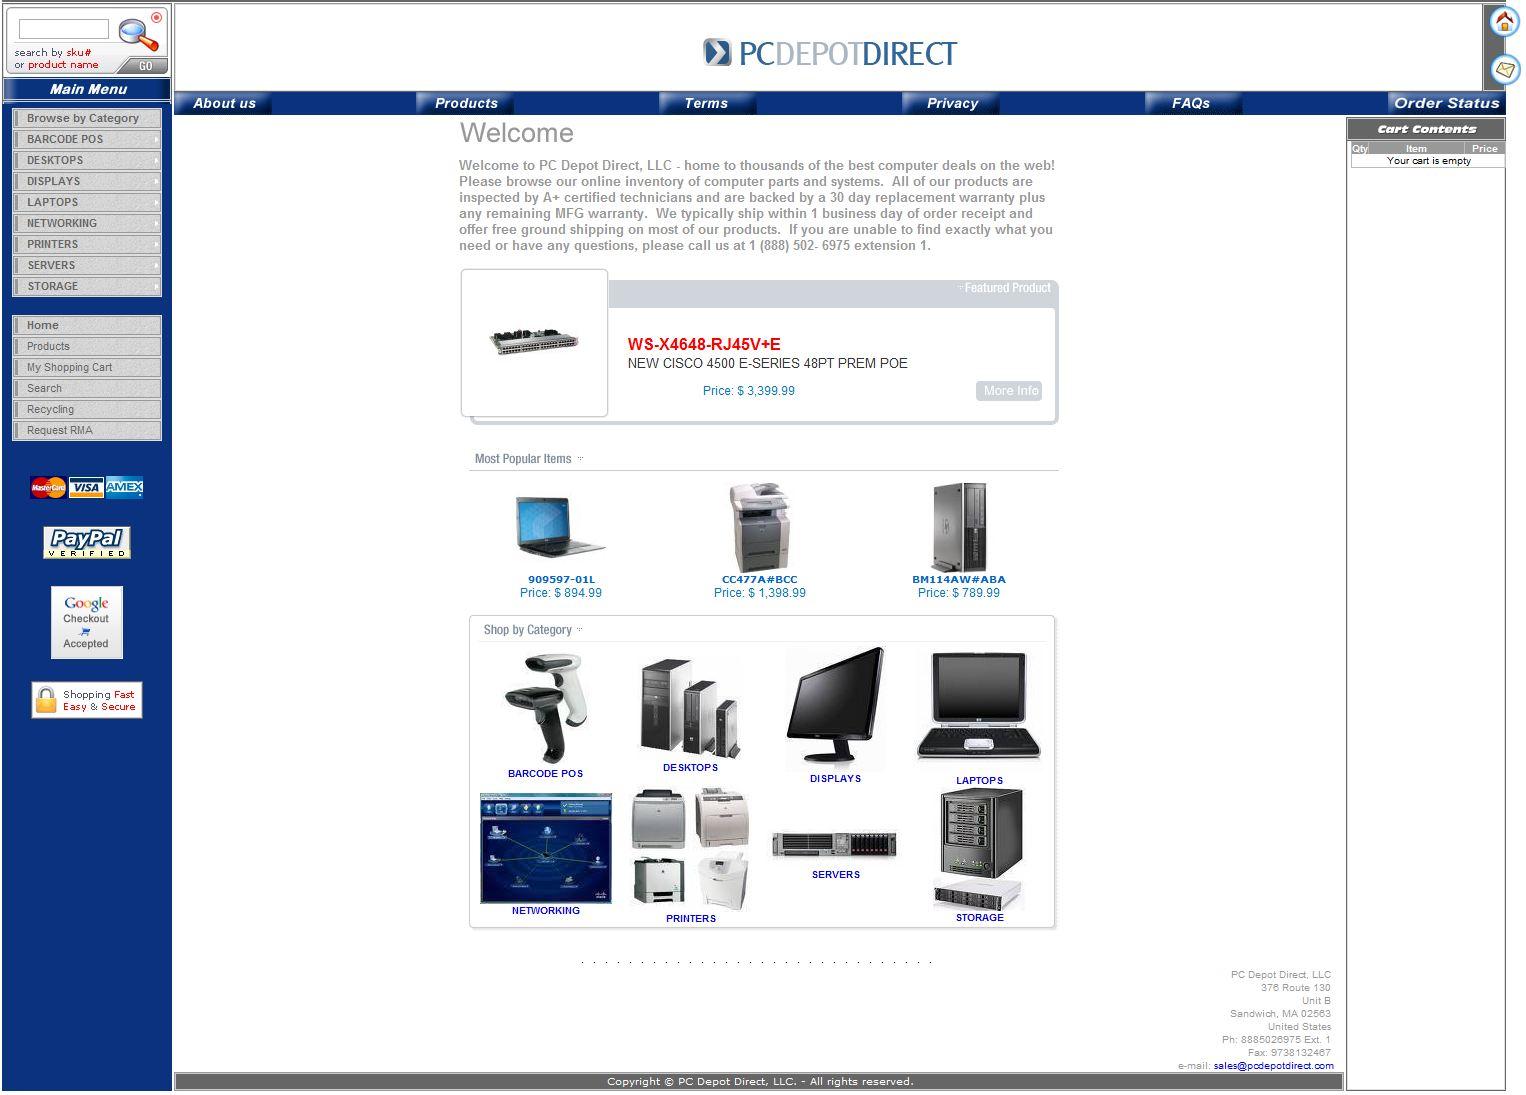 PC Depot Direct